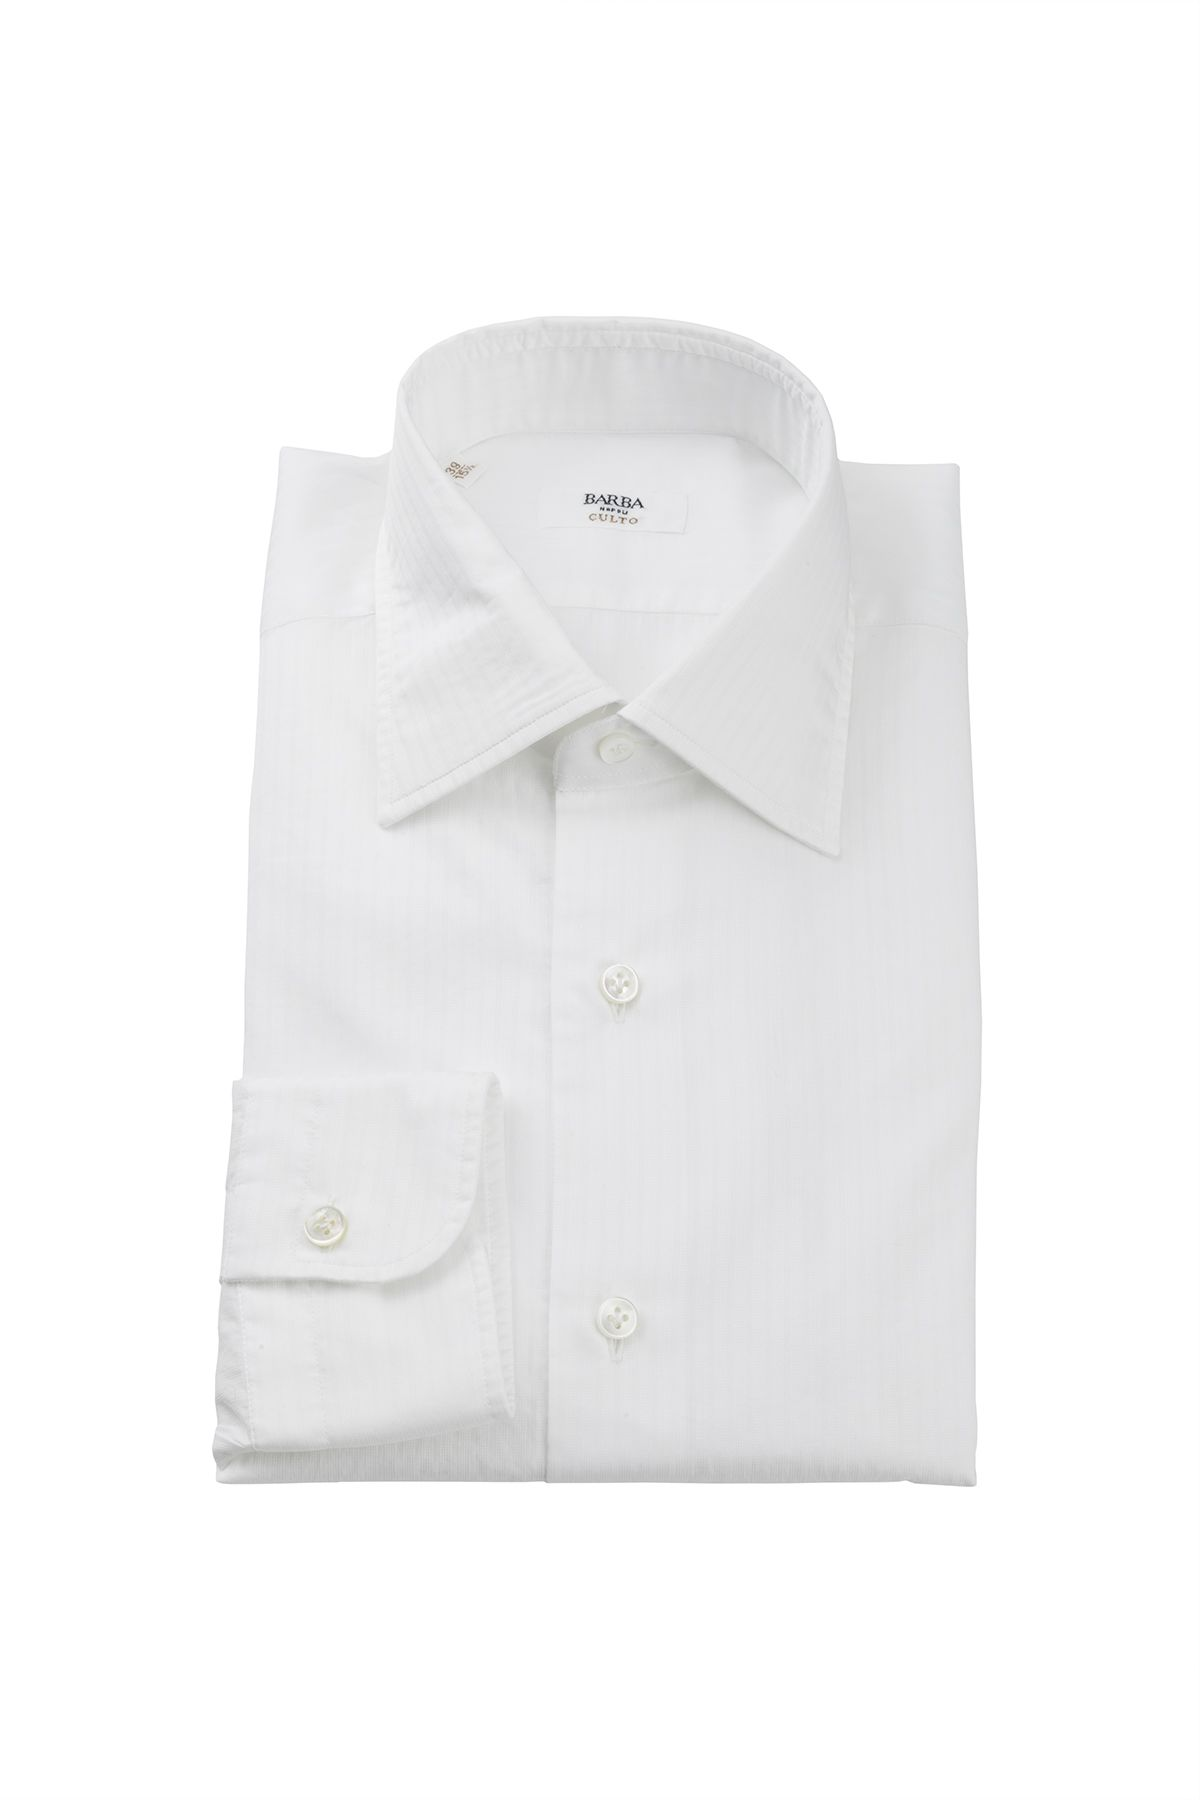 Culto Shirt